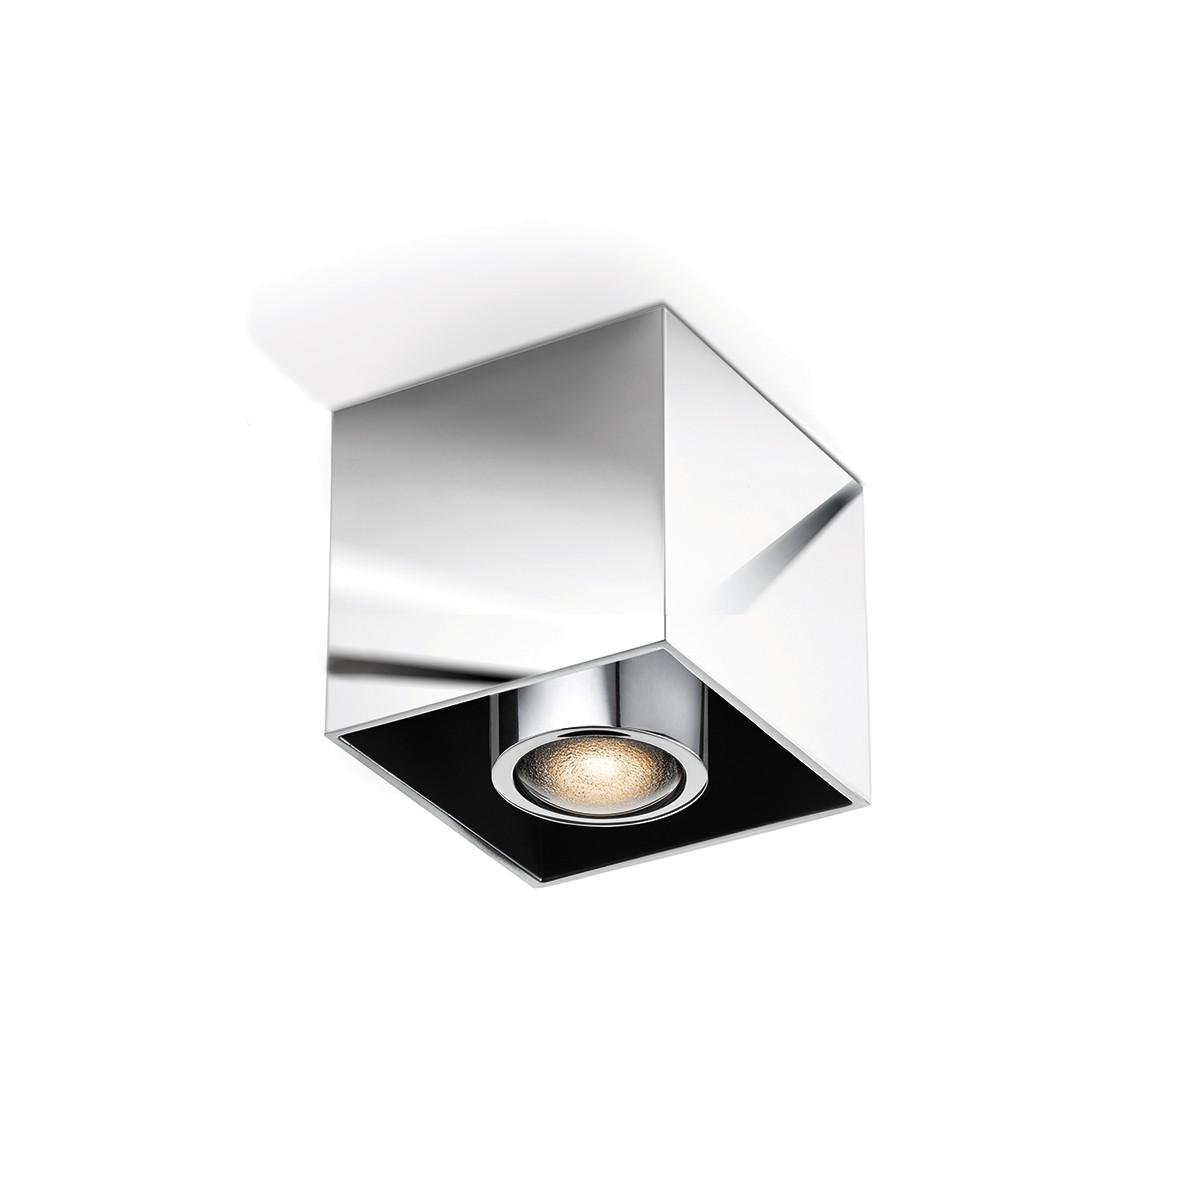 Bruck Cranny Spot LED Mono C Deckenleuchte, Chrom